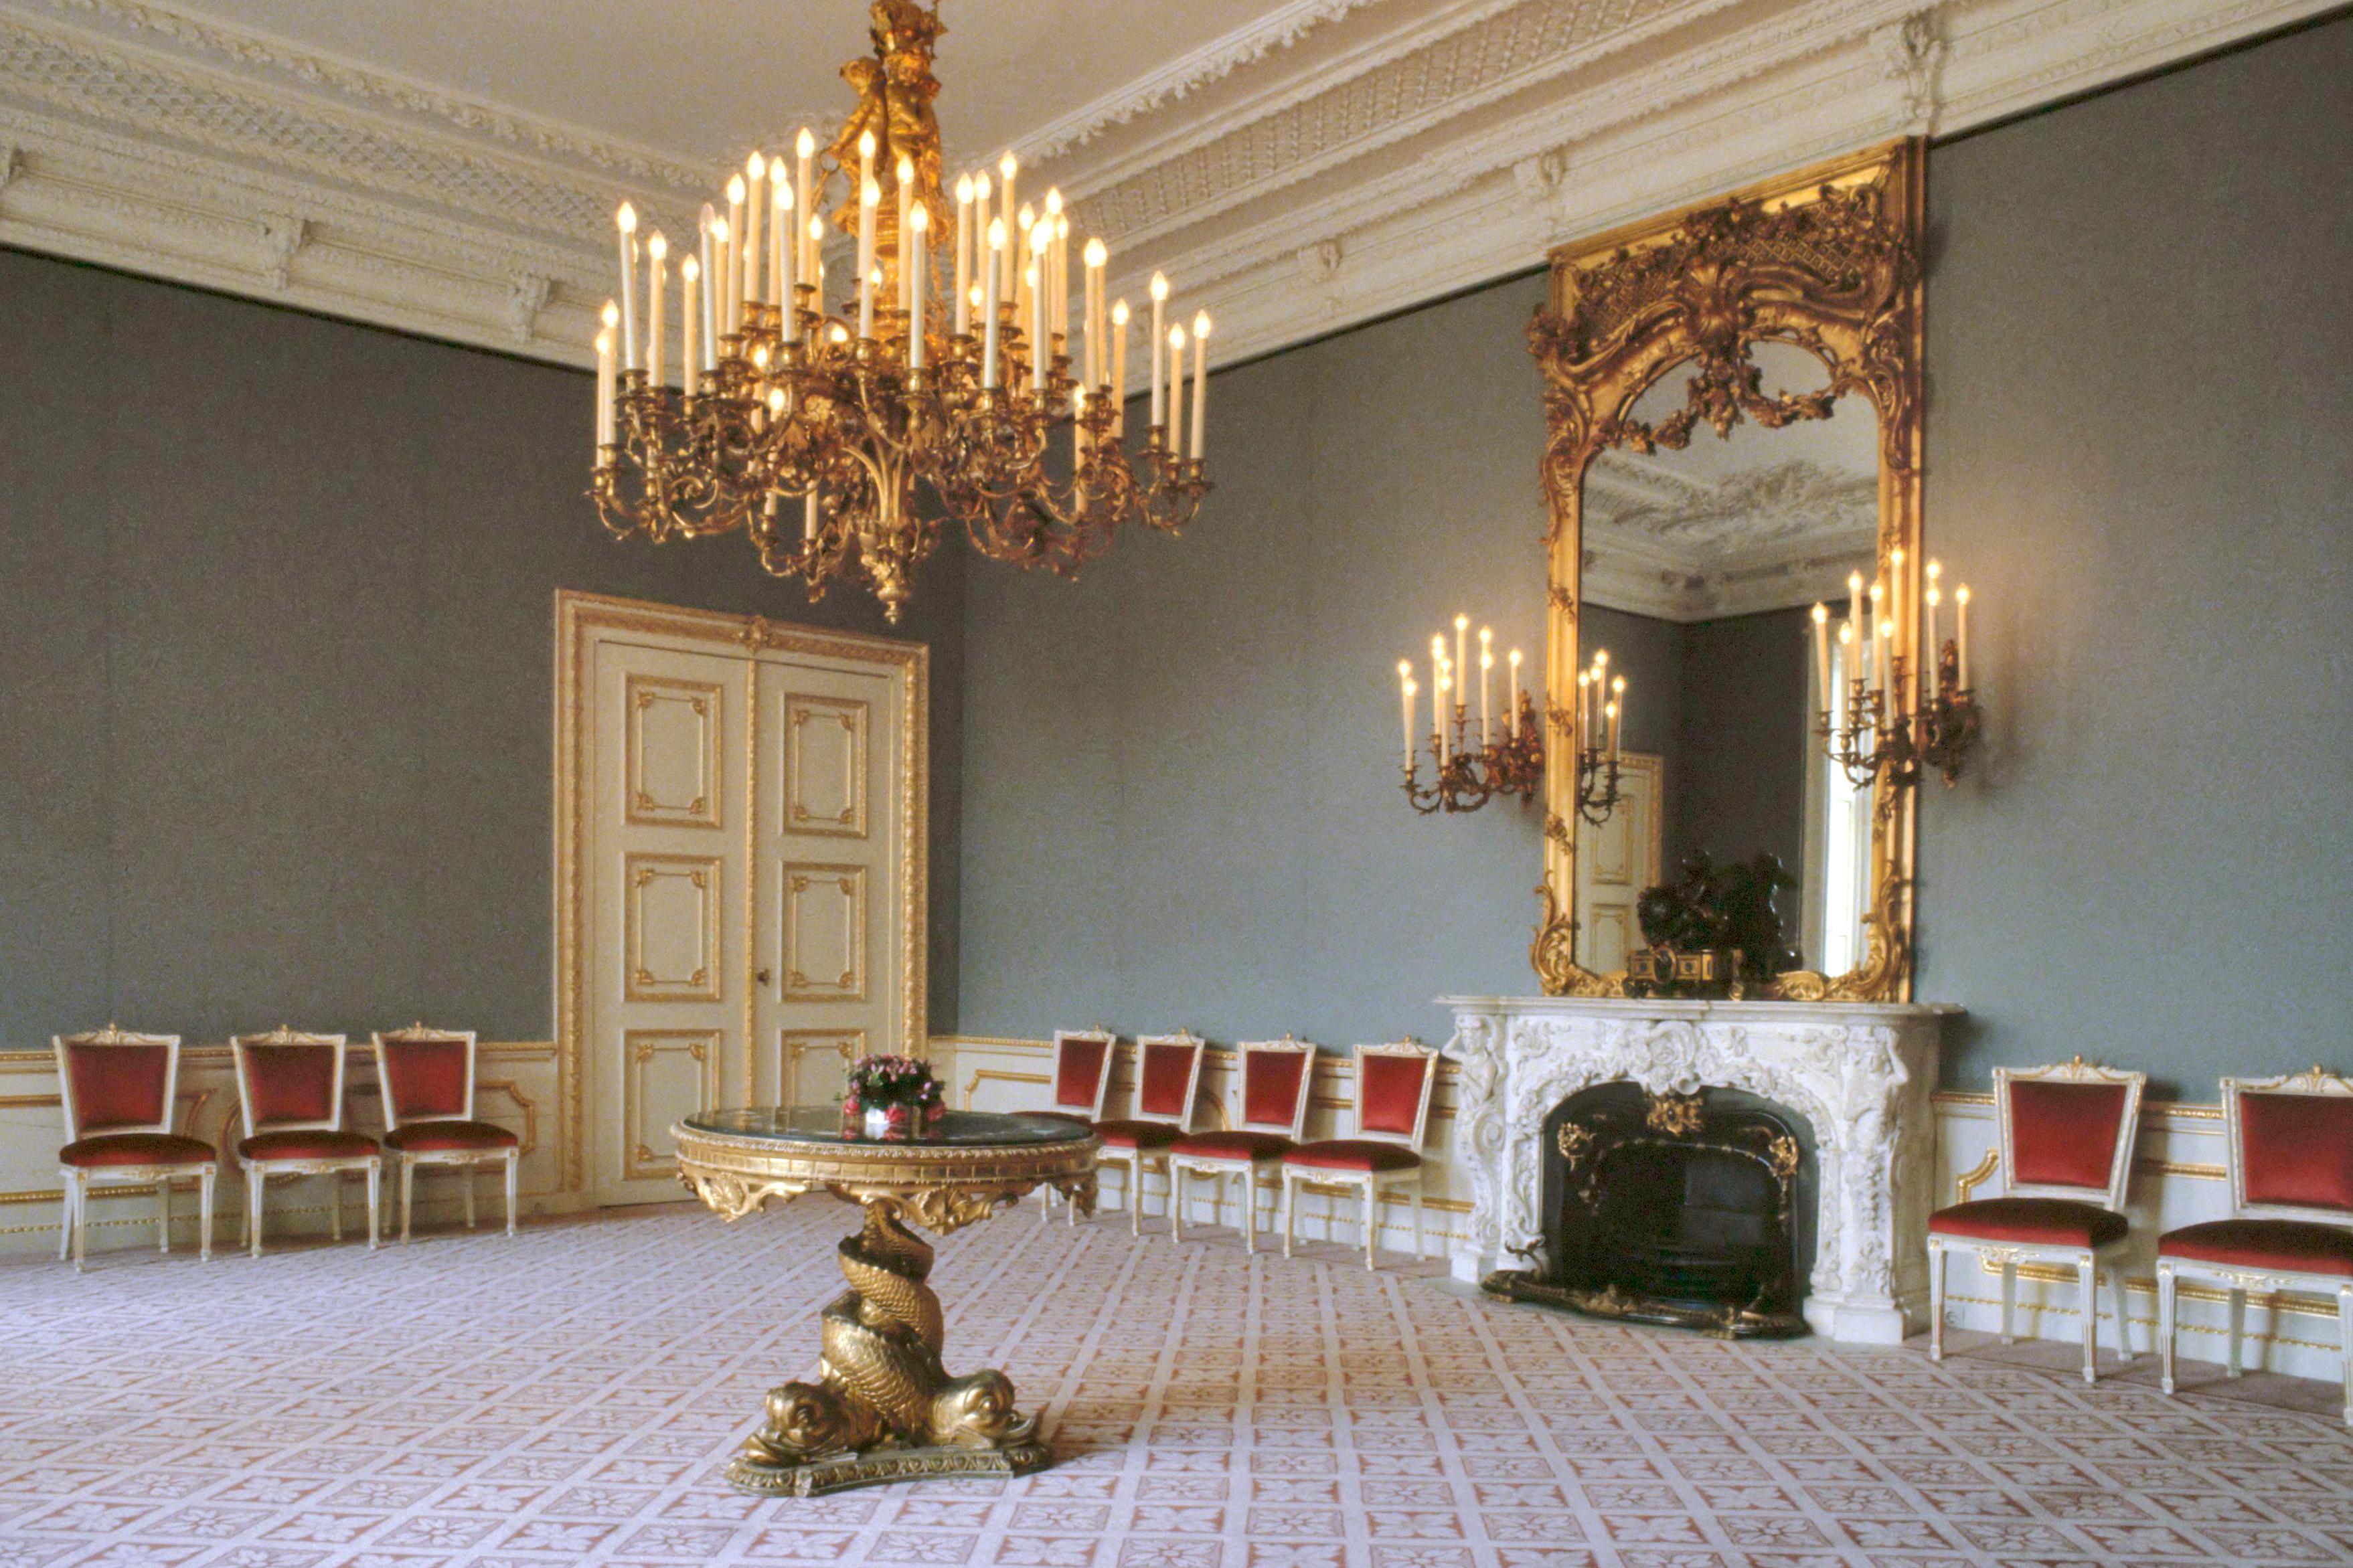 File:Interieur Paleis Noordeinde - ontvangsten vergaderkamer (1984 ...